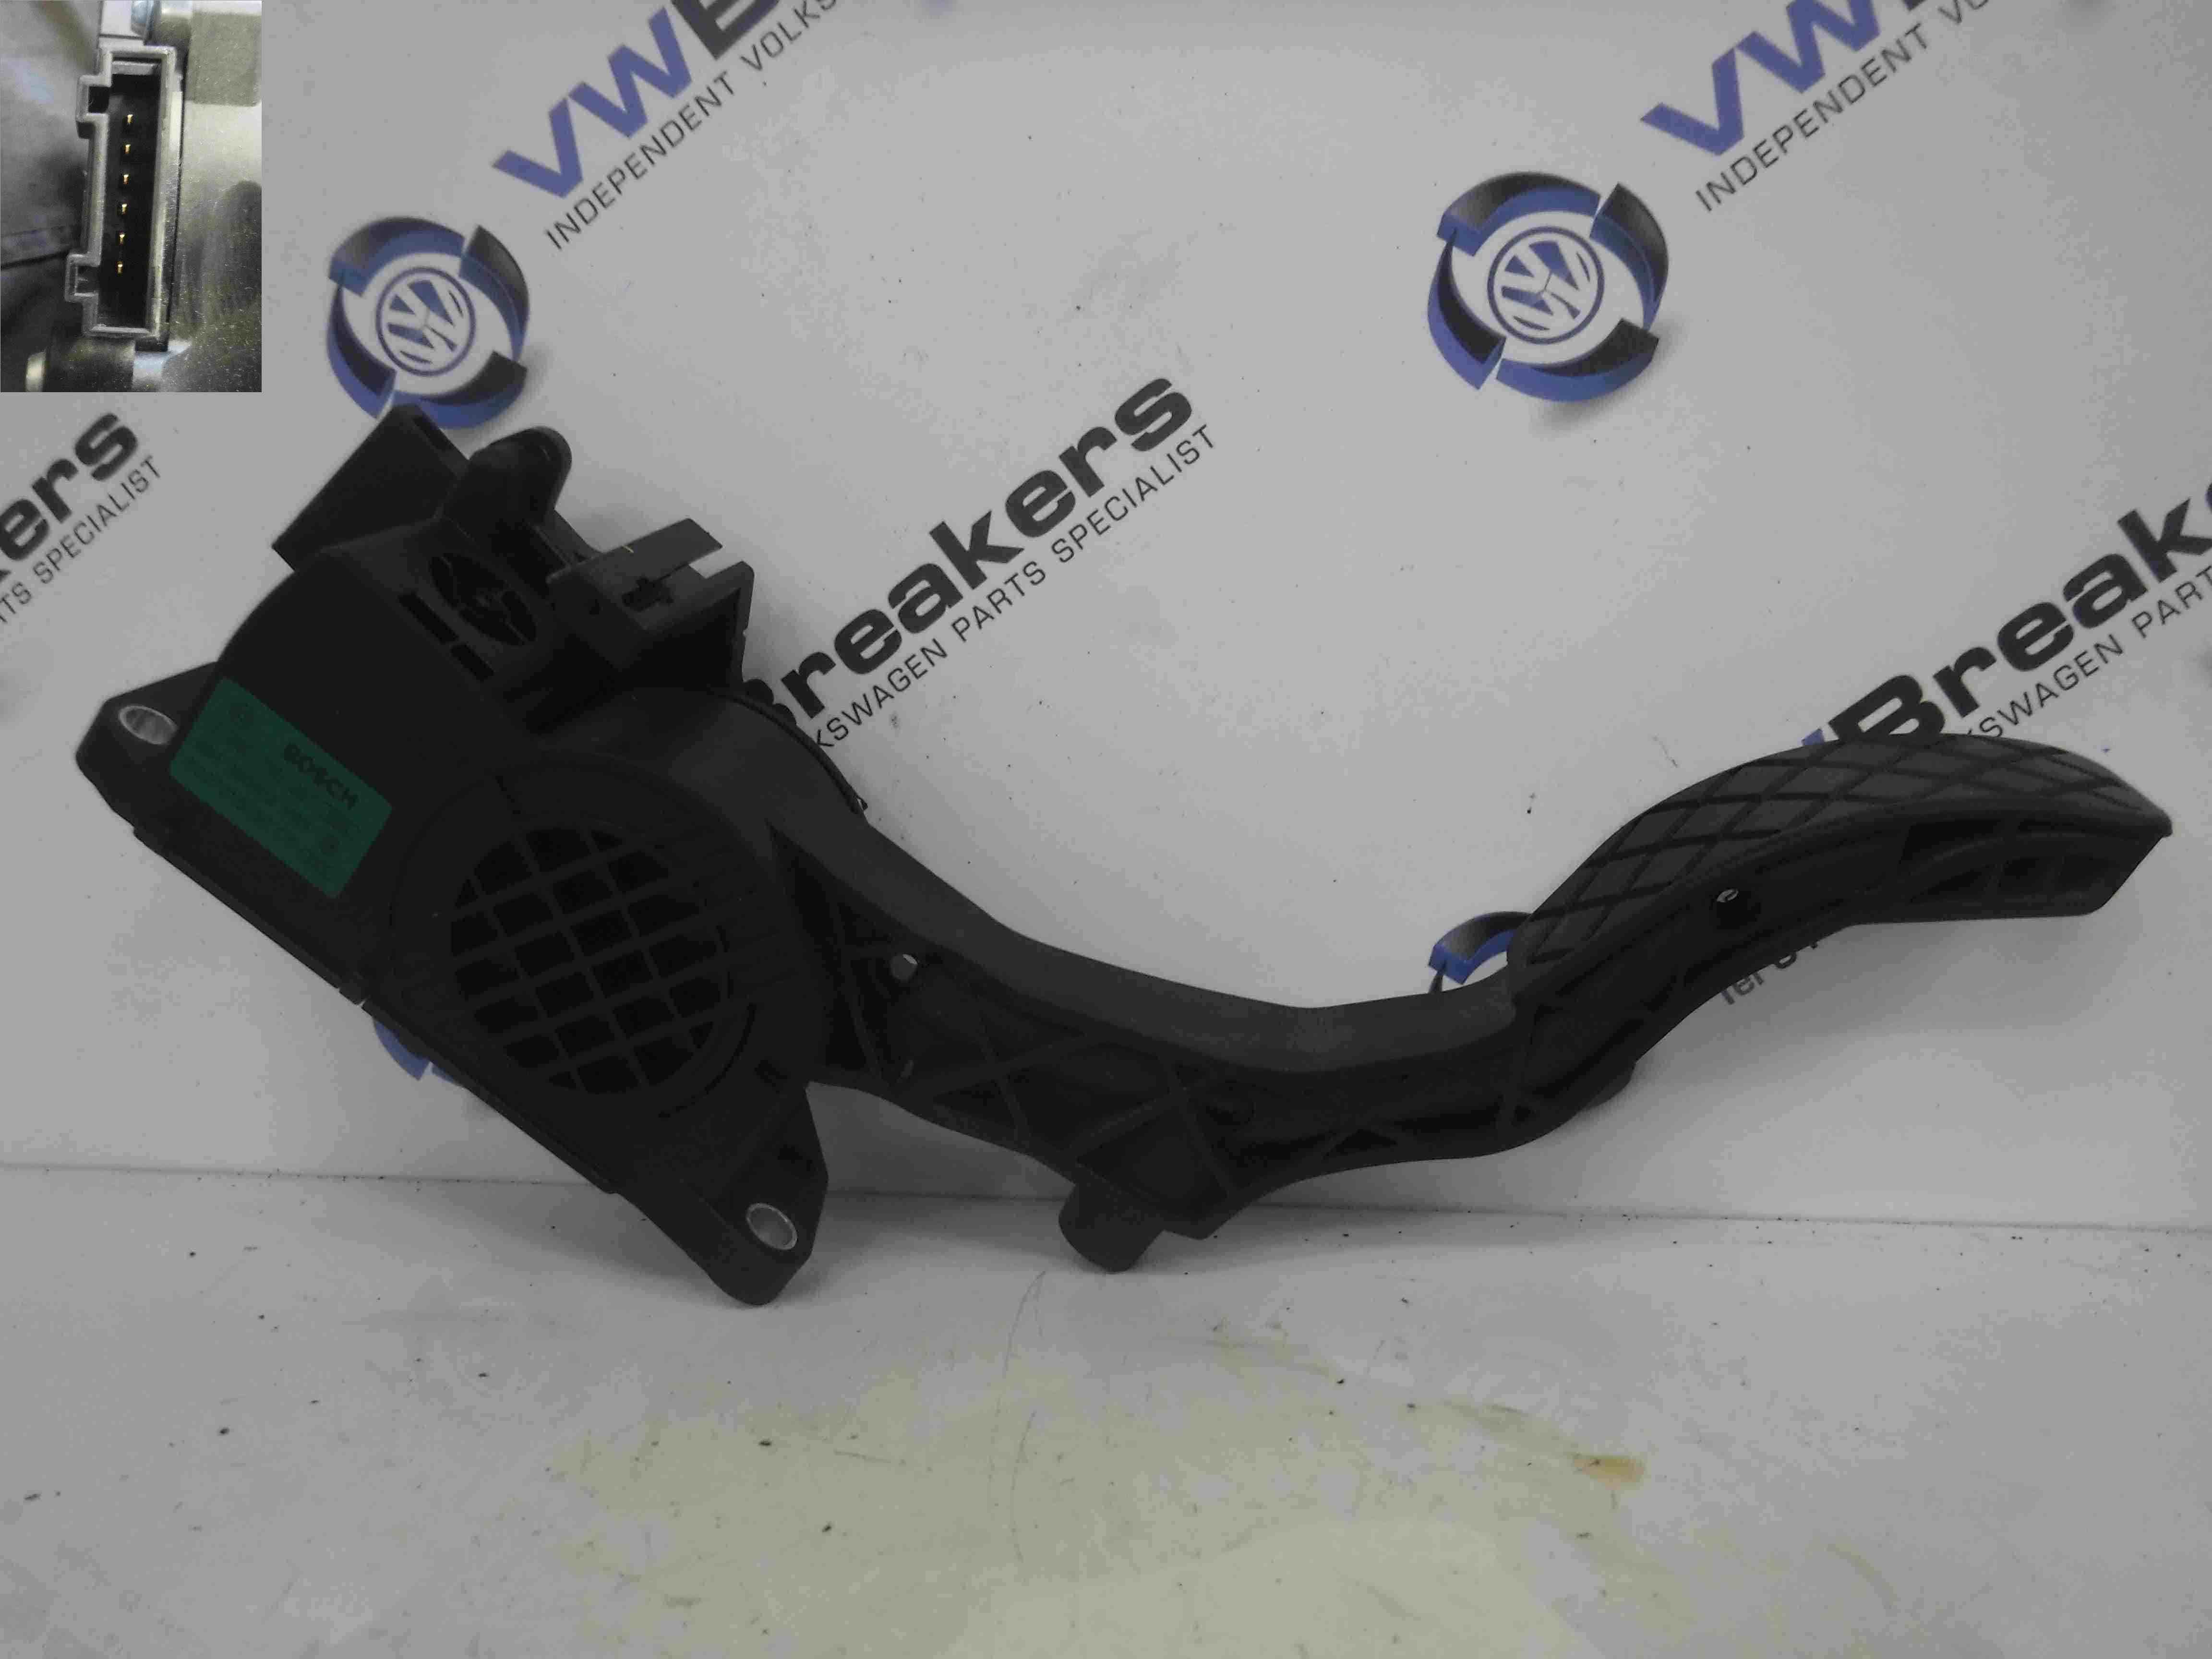 Volkswagen Polo 2006-2008 9N3 Accelerator Throttle Pedal 6Q2721503E